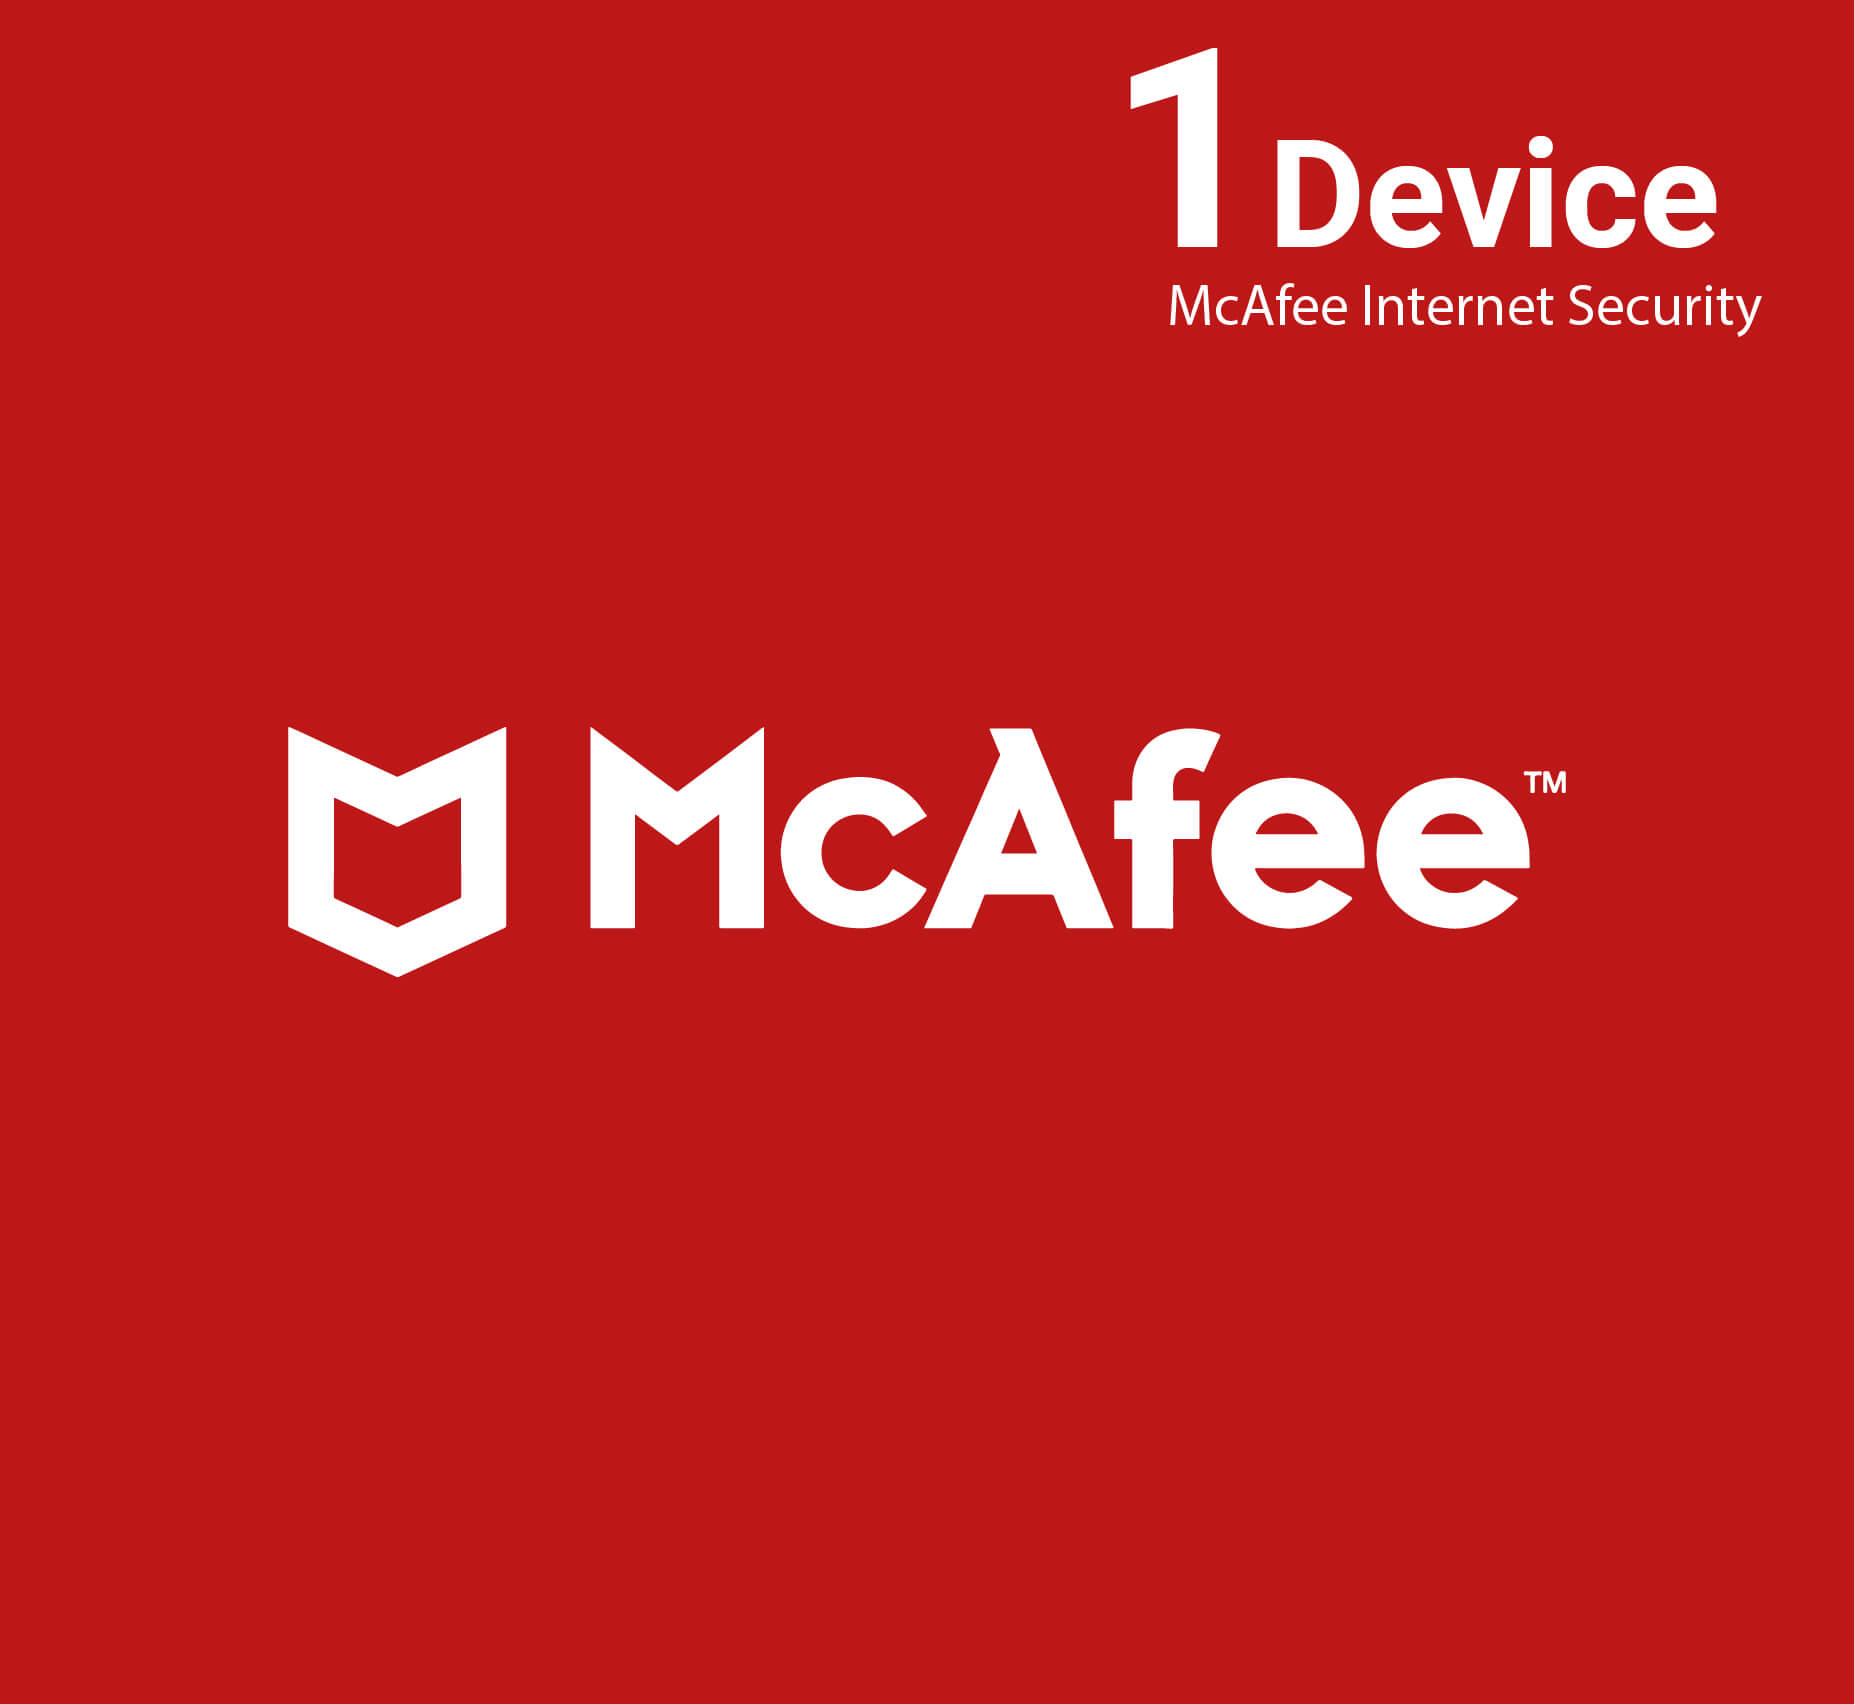 McAfee Internet Security 1 Device